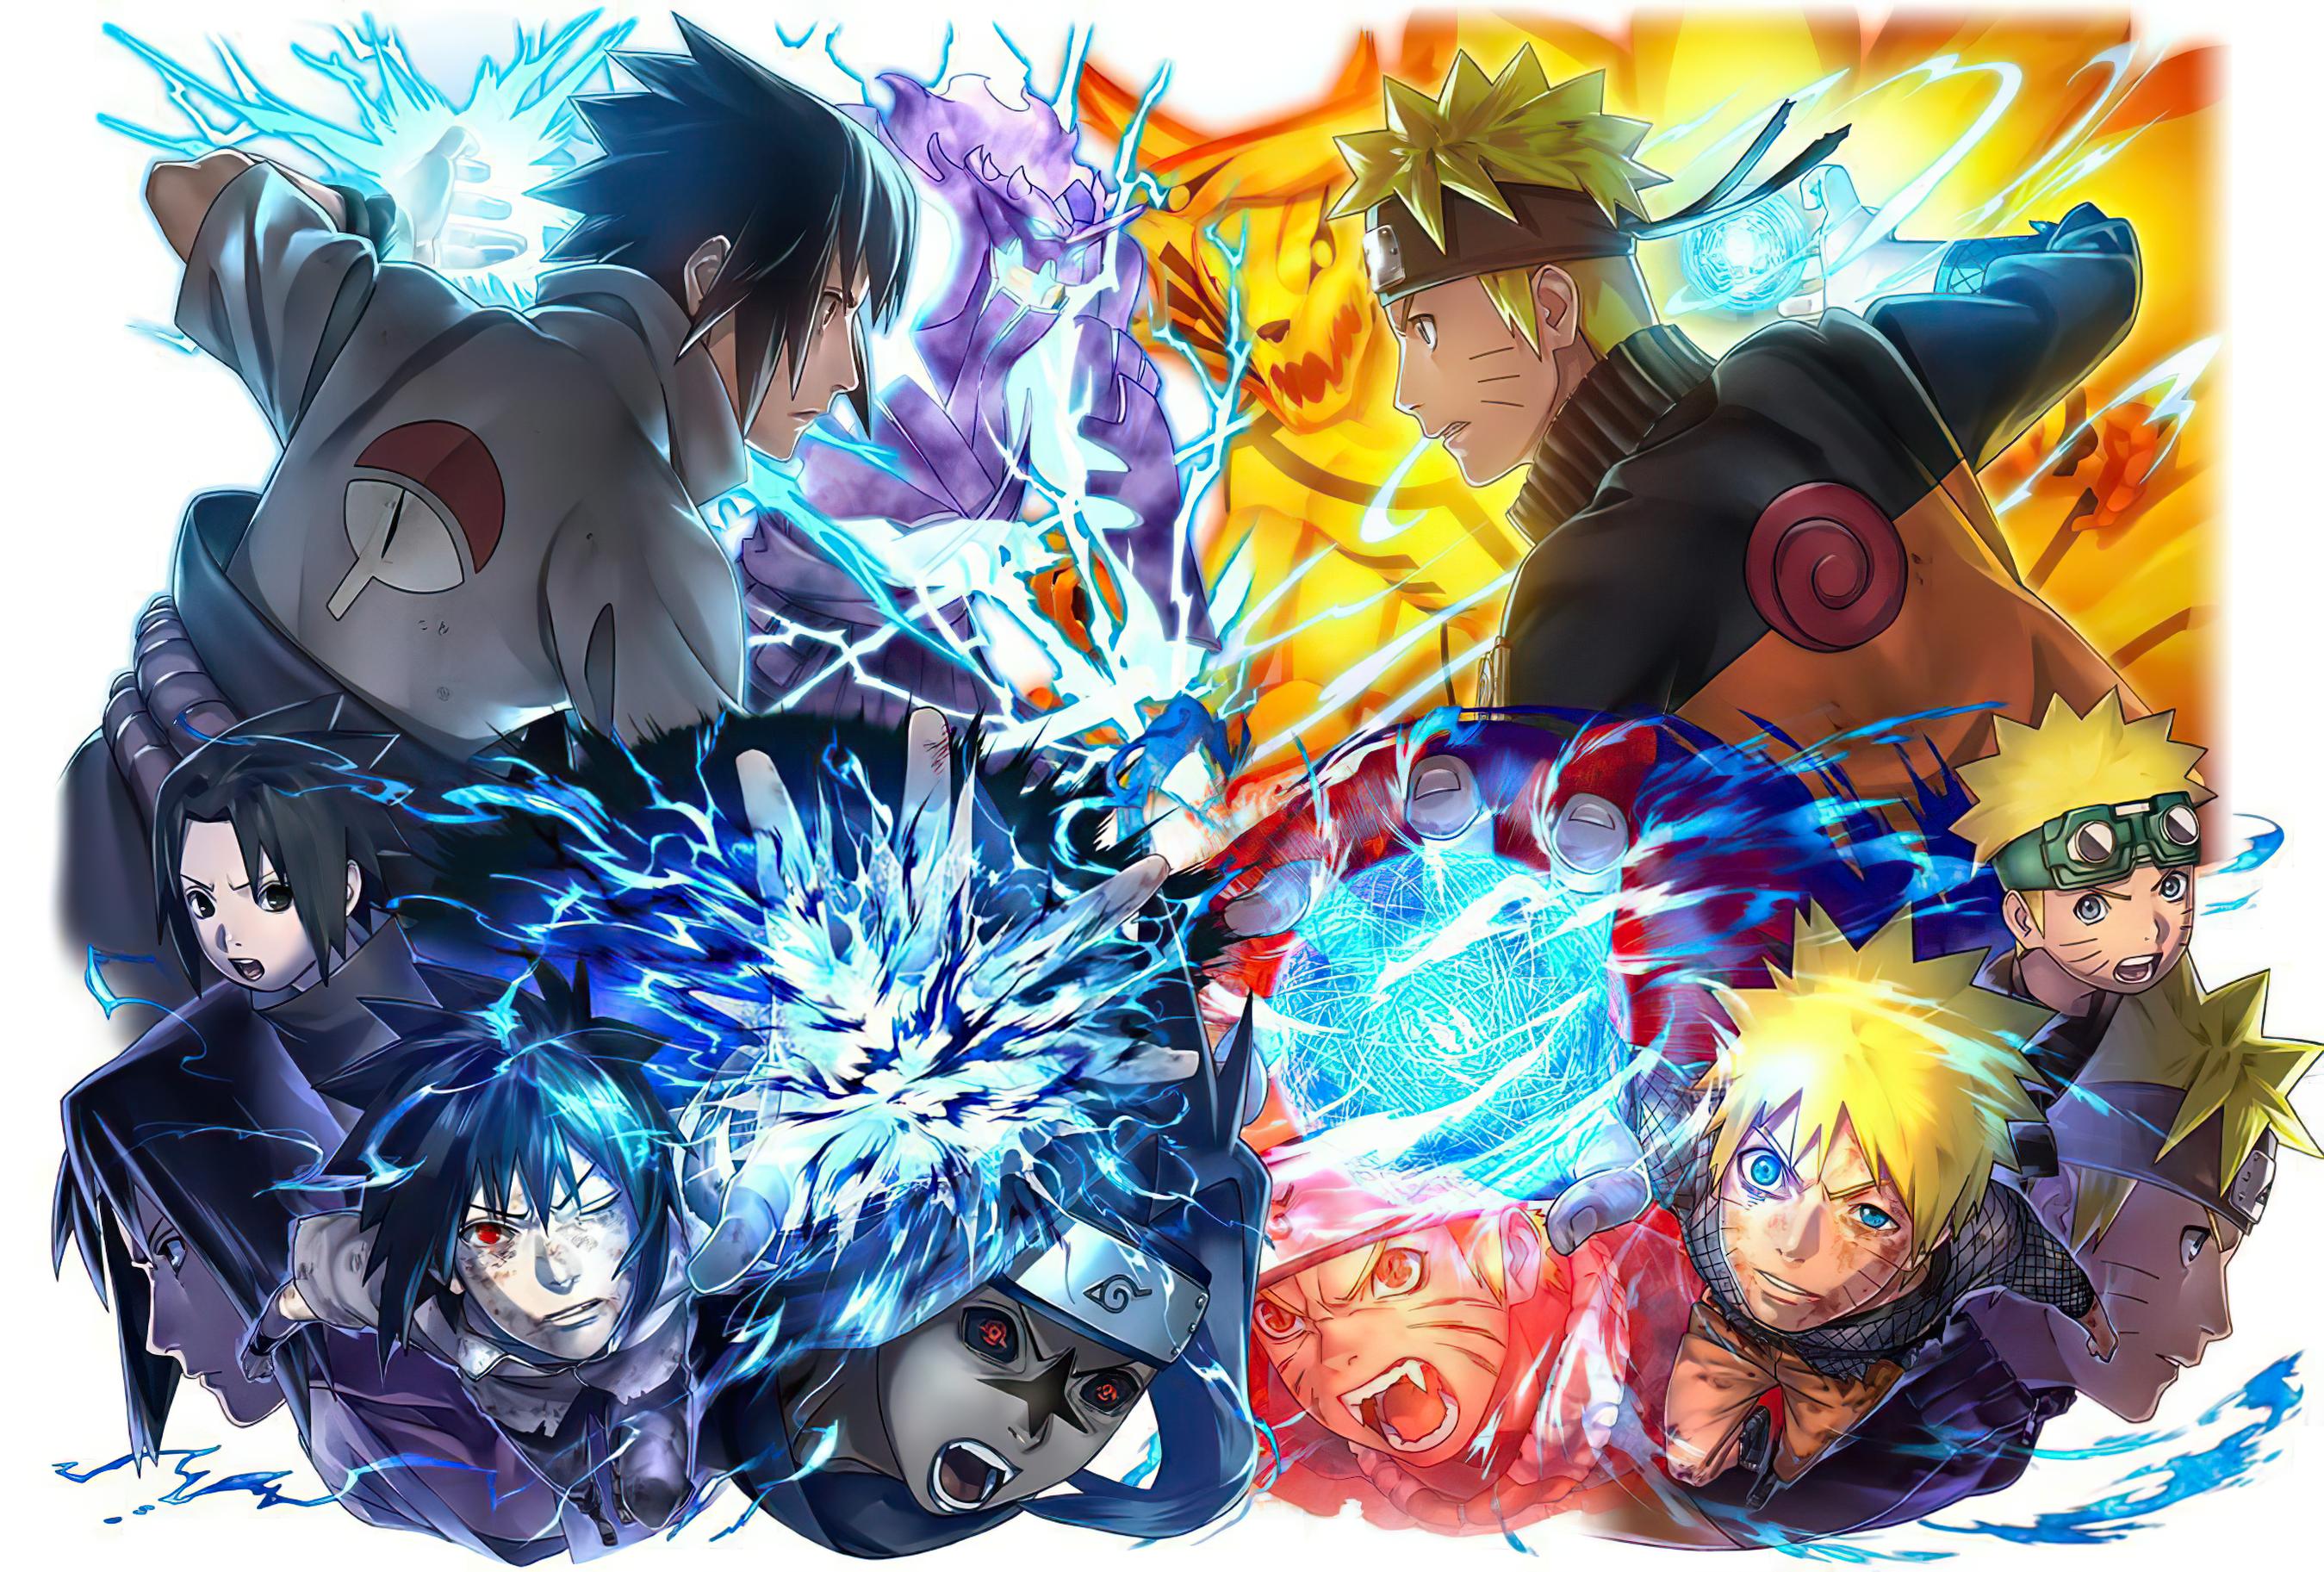 Naruto Fond d'écran HD | Arrière-Plan | 2698x1825 | ID:1060703 - Wallpaper Abyss